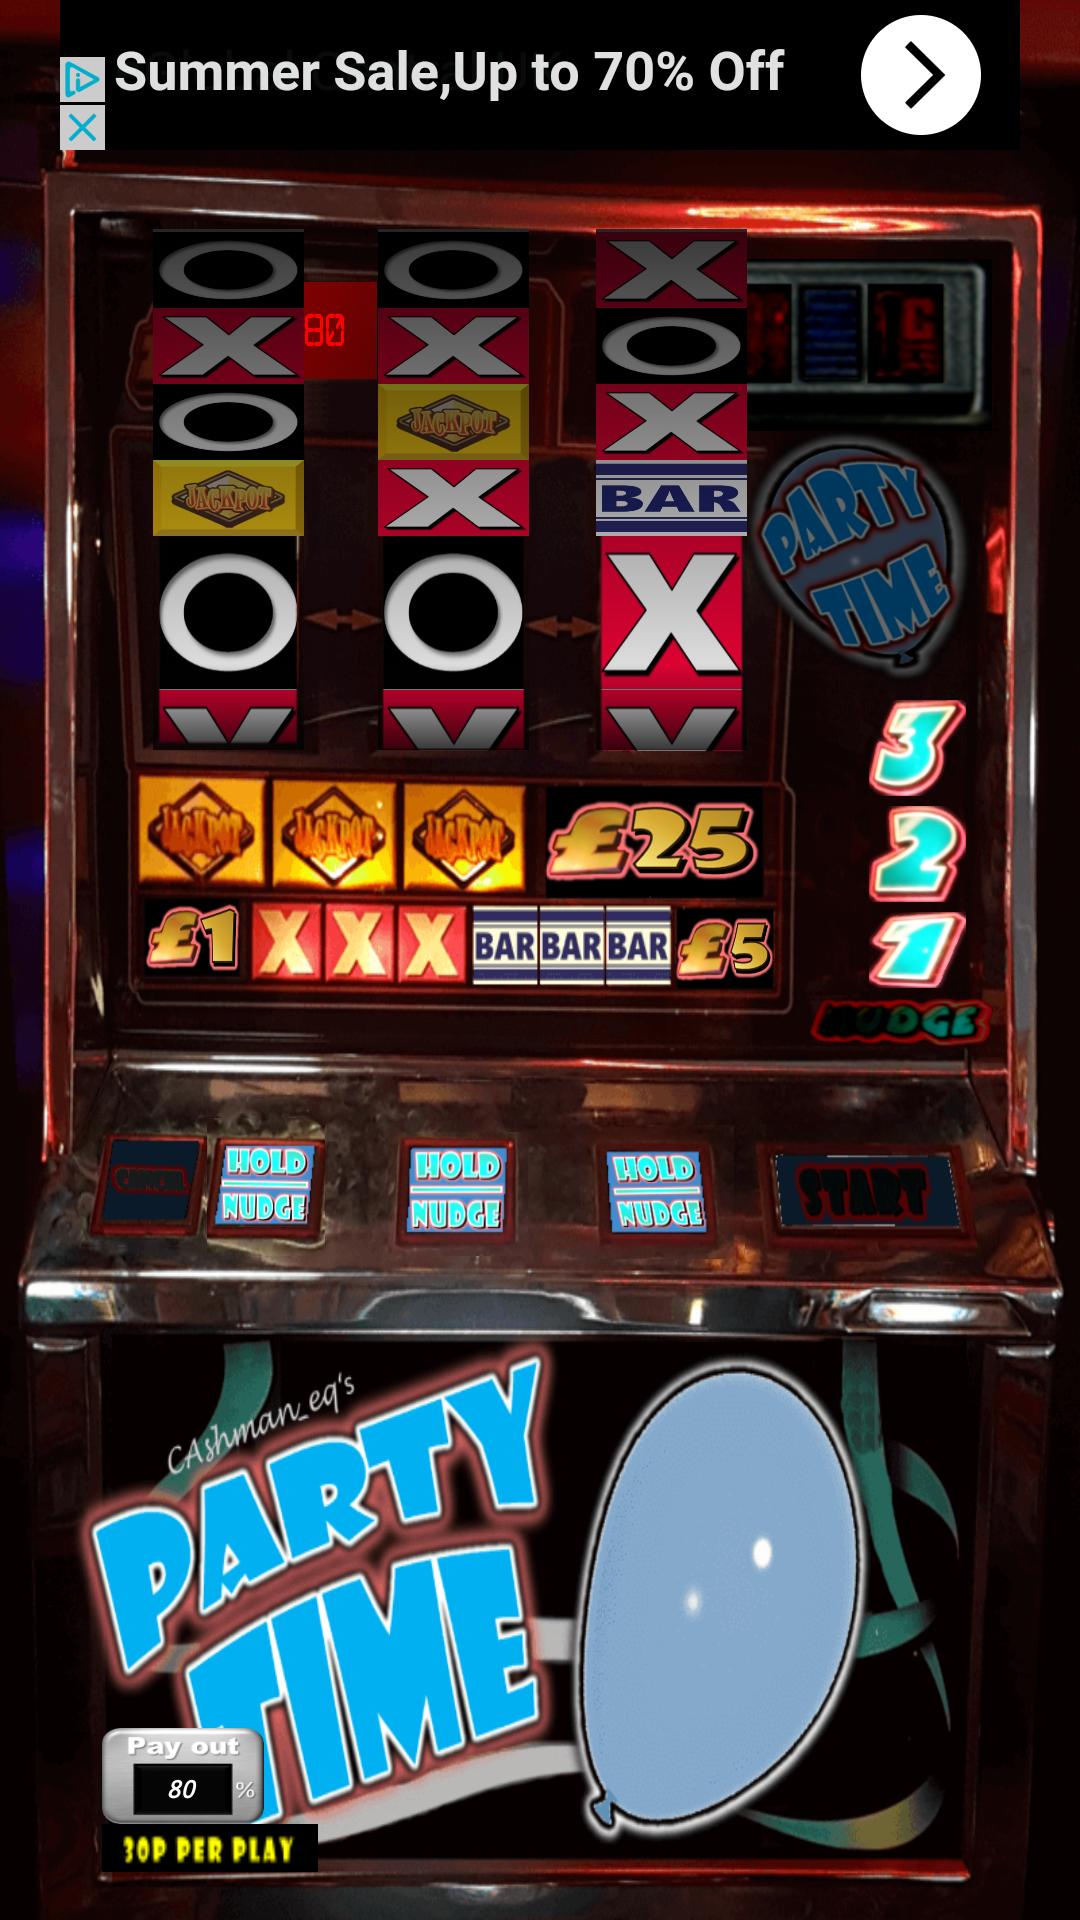 Europa casino auszahlungen